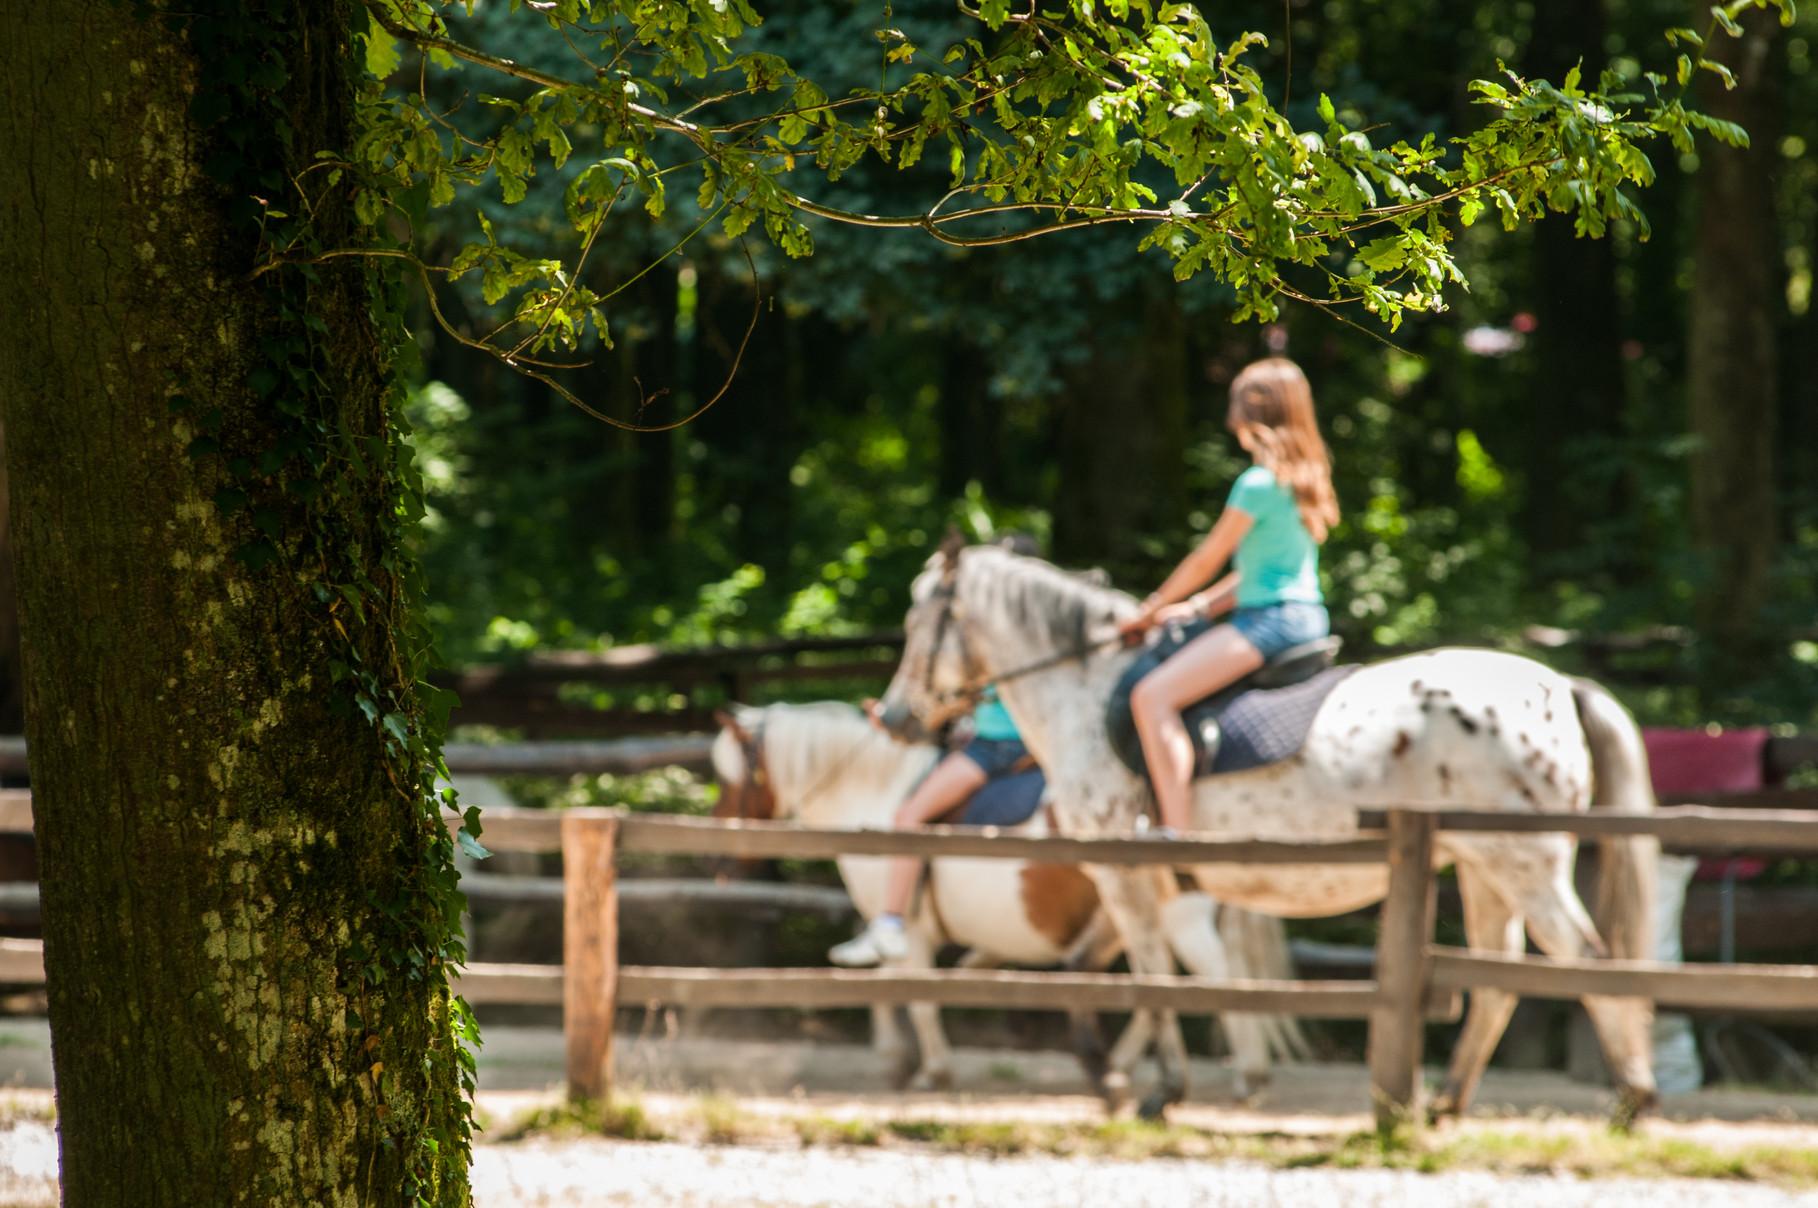 Manège à poneys à Sillé Plage © Stevan Lira